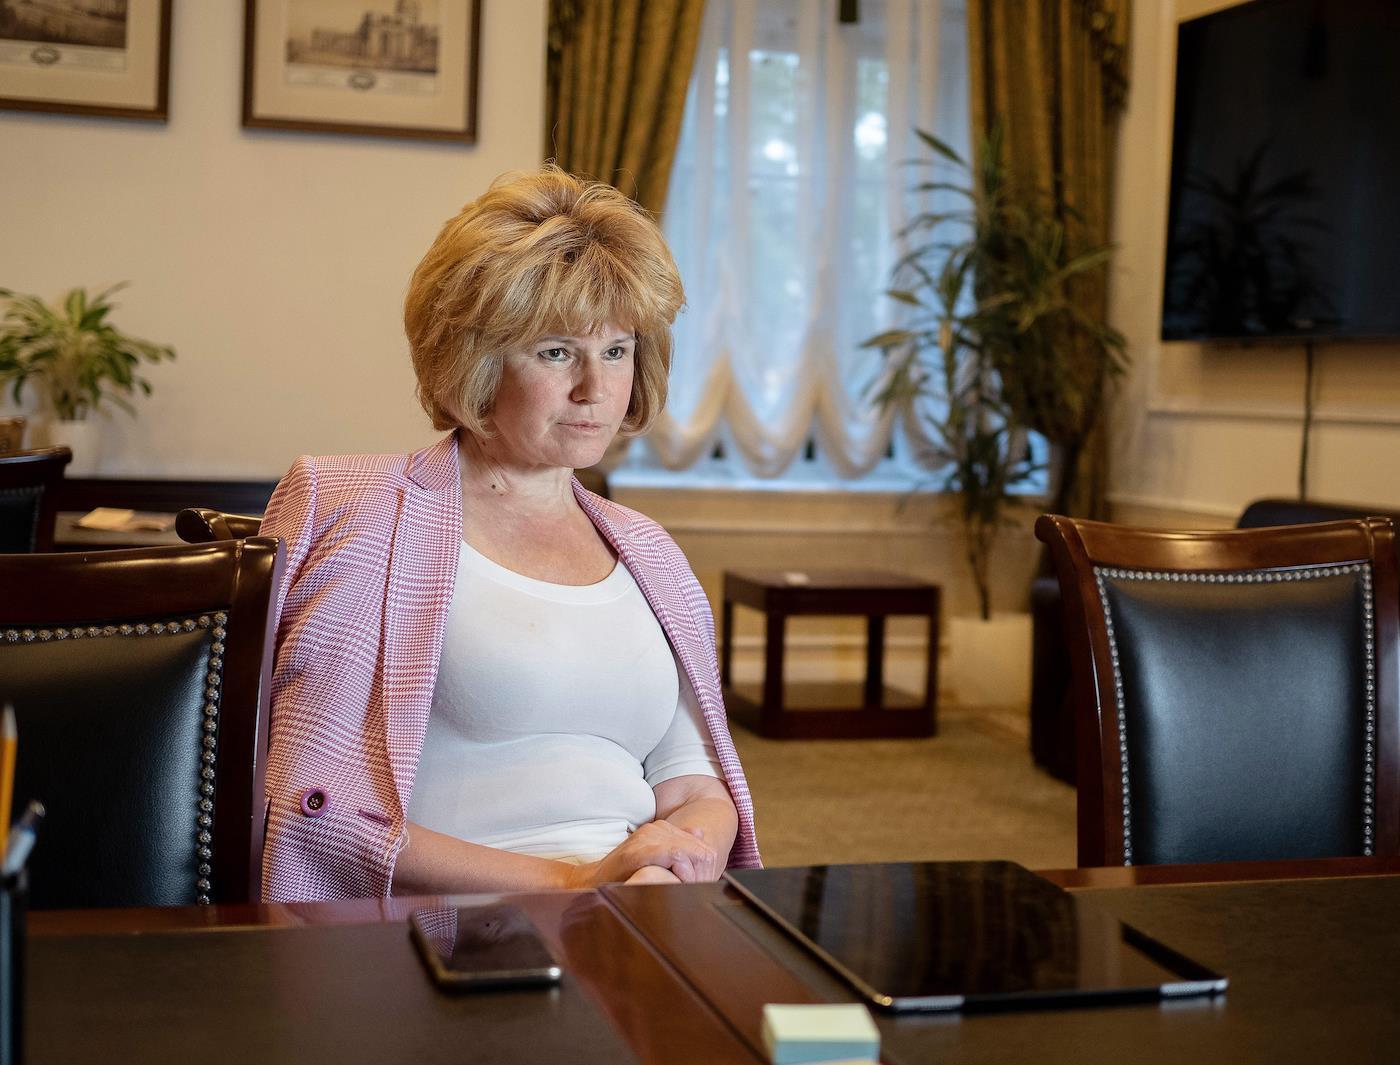 вице-губернатор Ирина Потехина<br><br>автор фото&nbsp;Евгений Павленко/Коммерсантъ